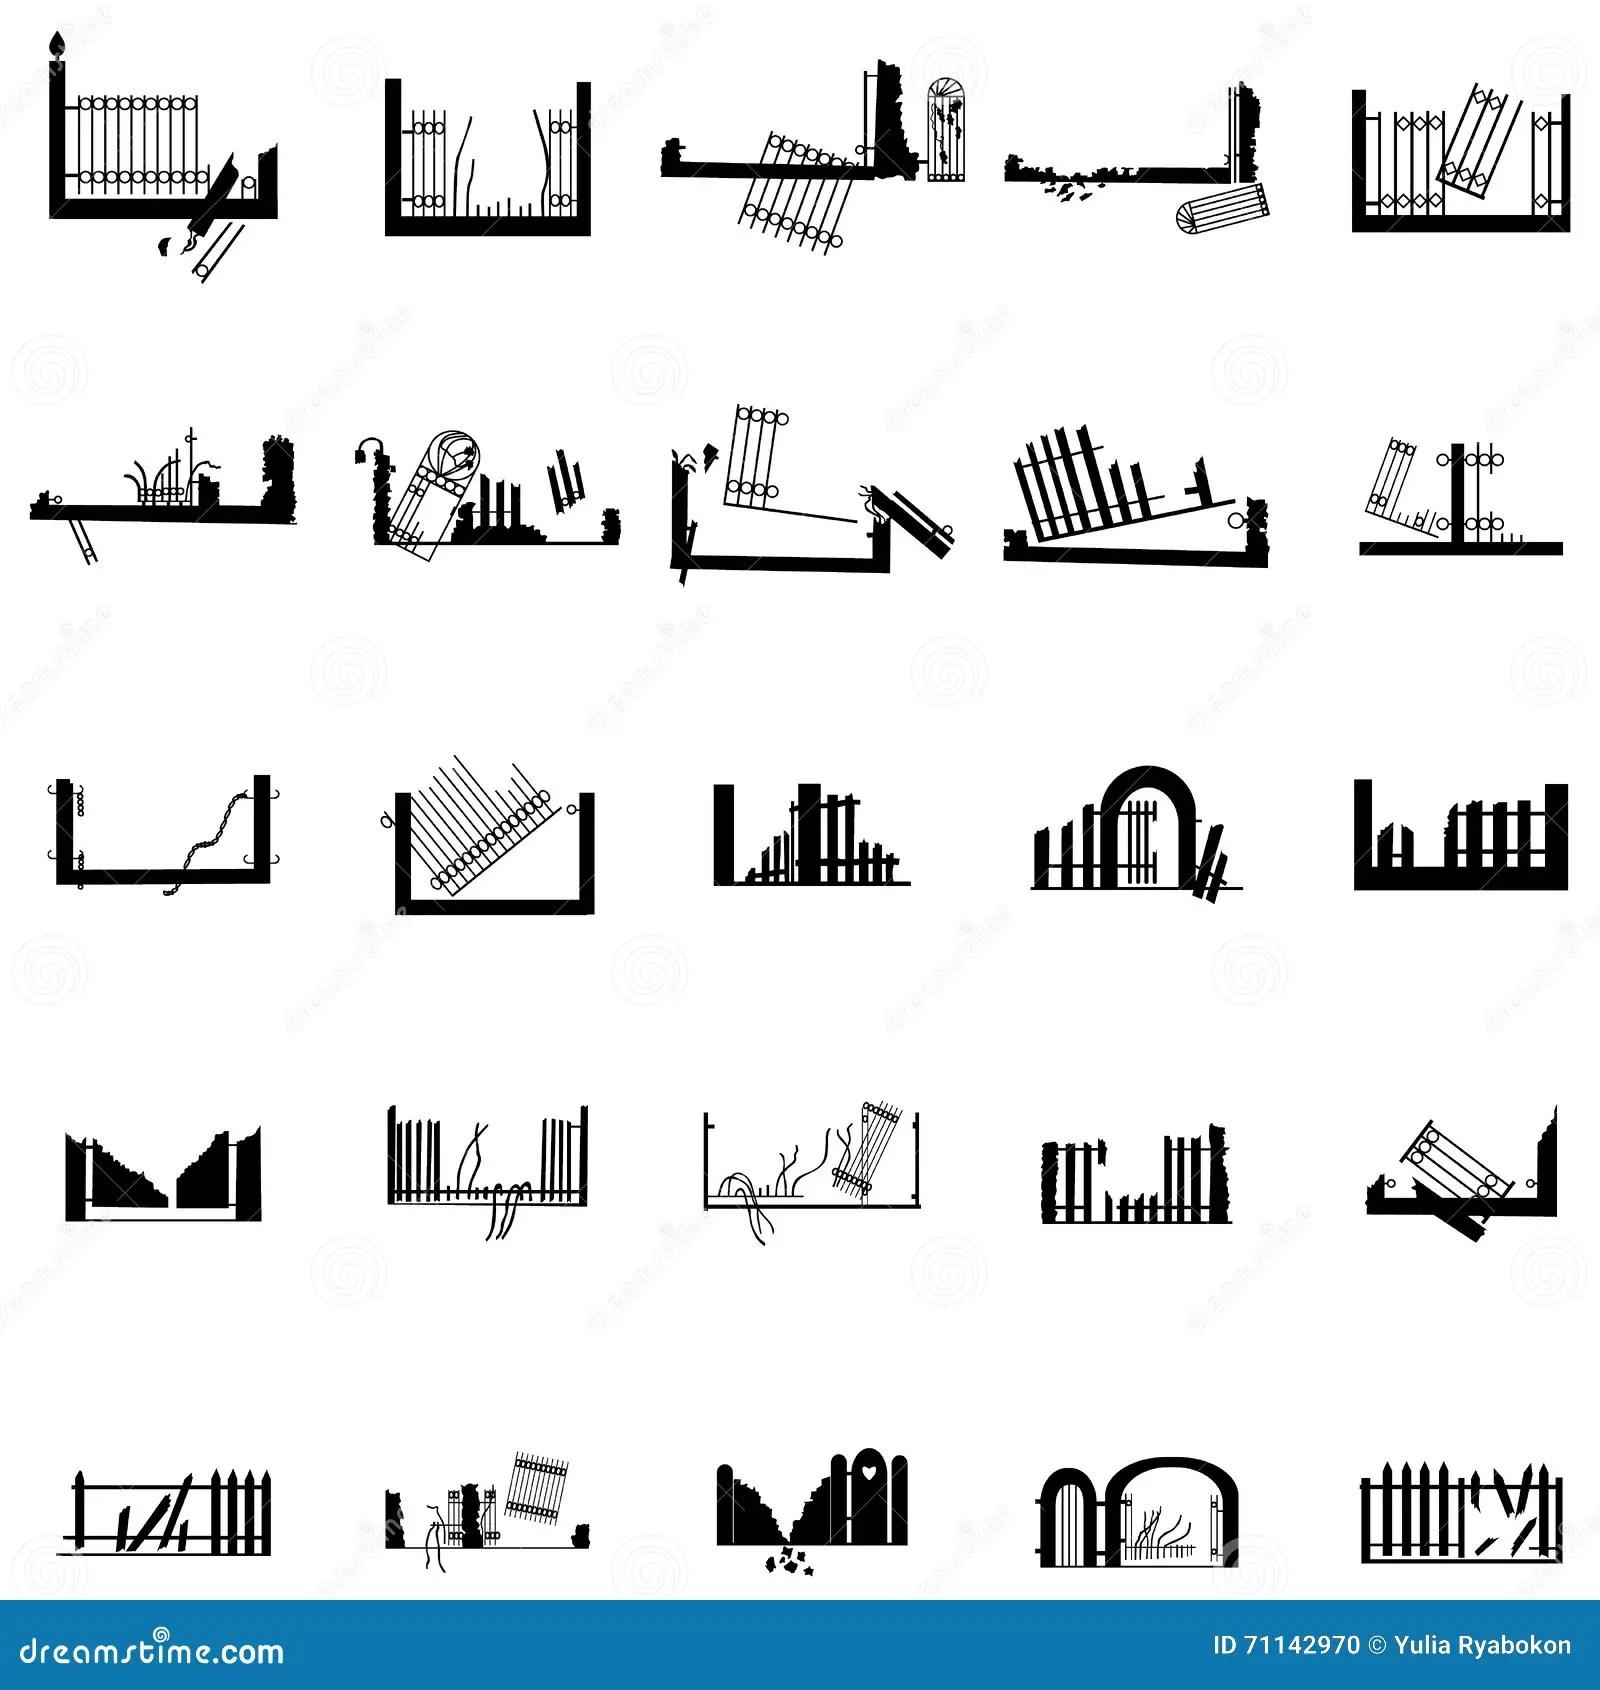 Broken Fence Silhouettes Set Vector Illustration